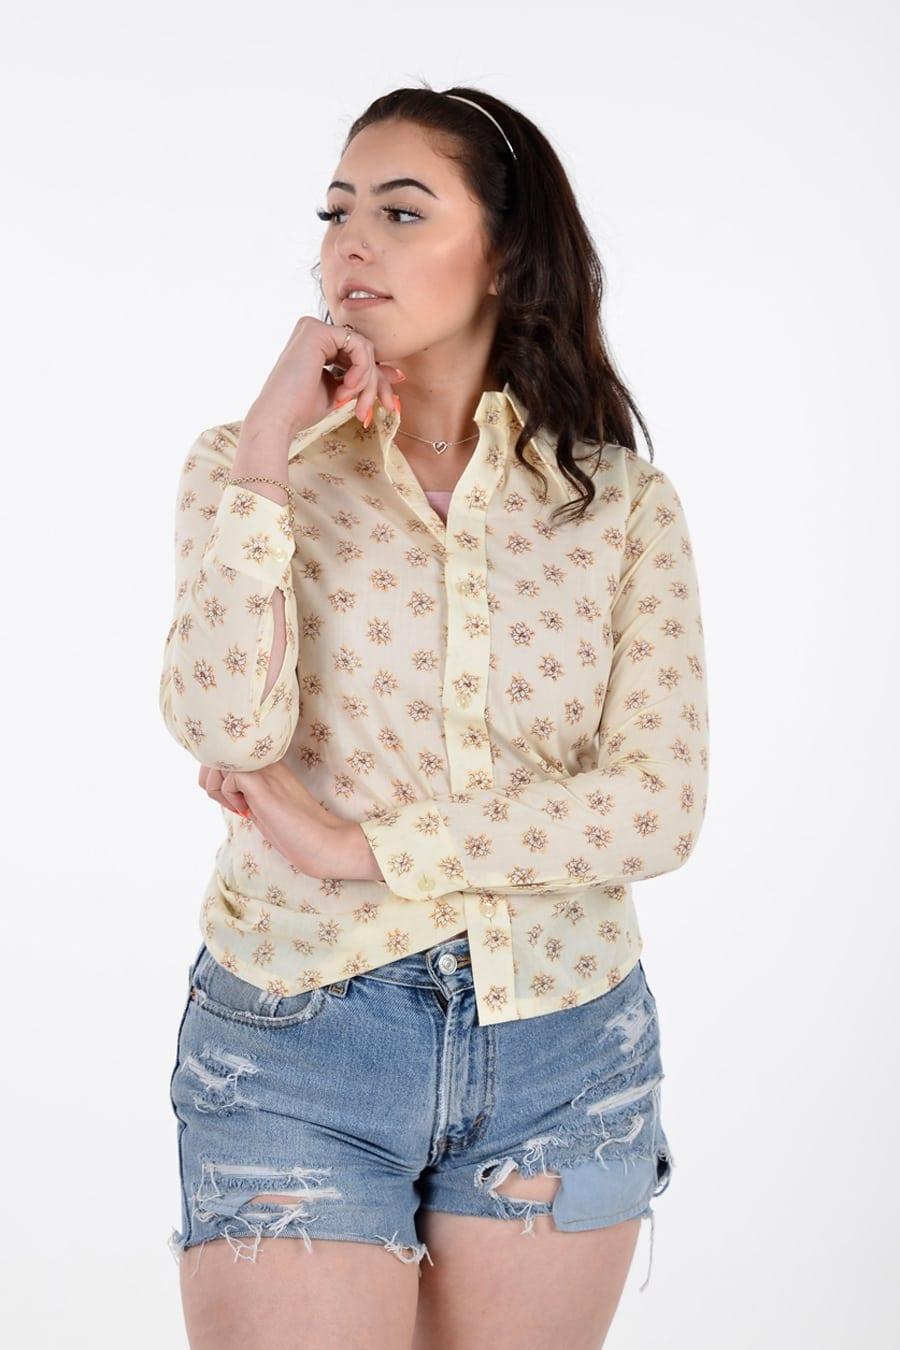 1970's floral shirt